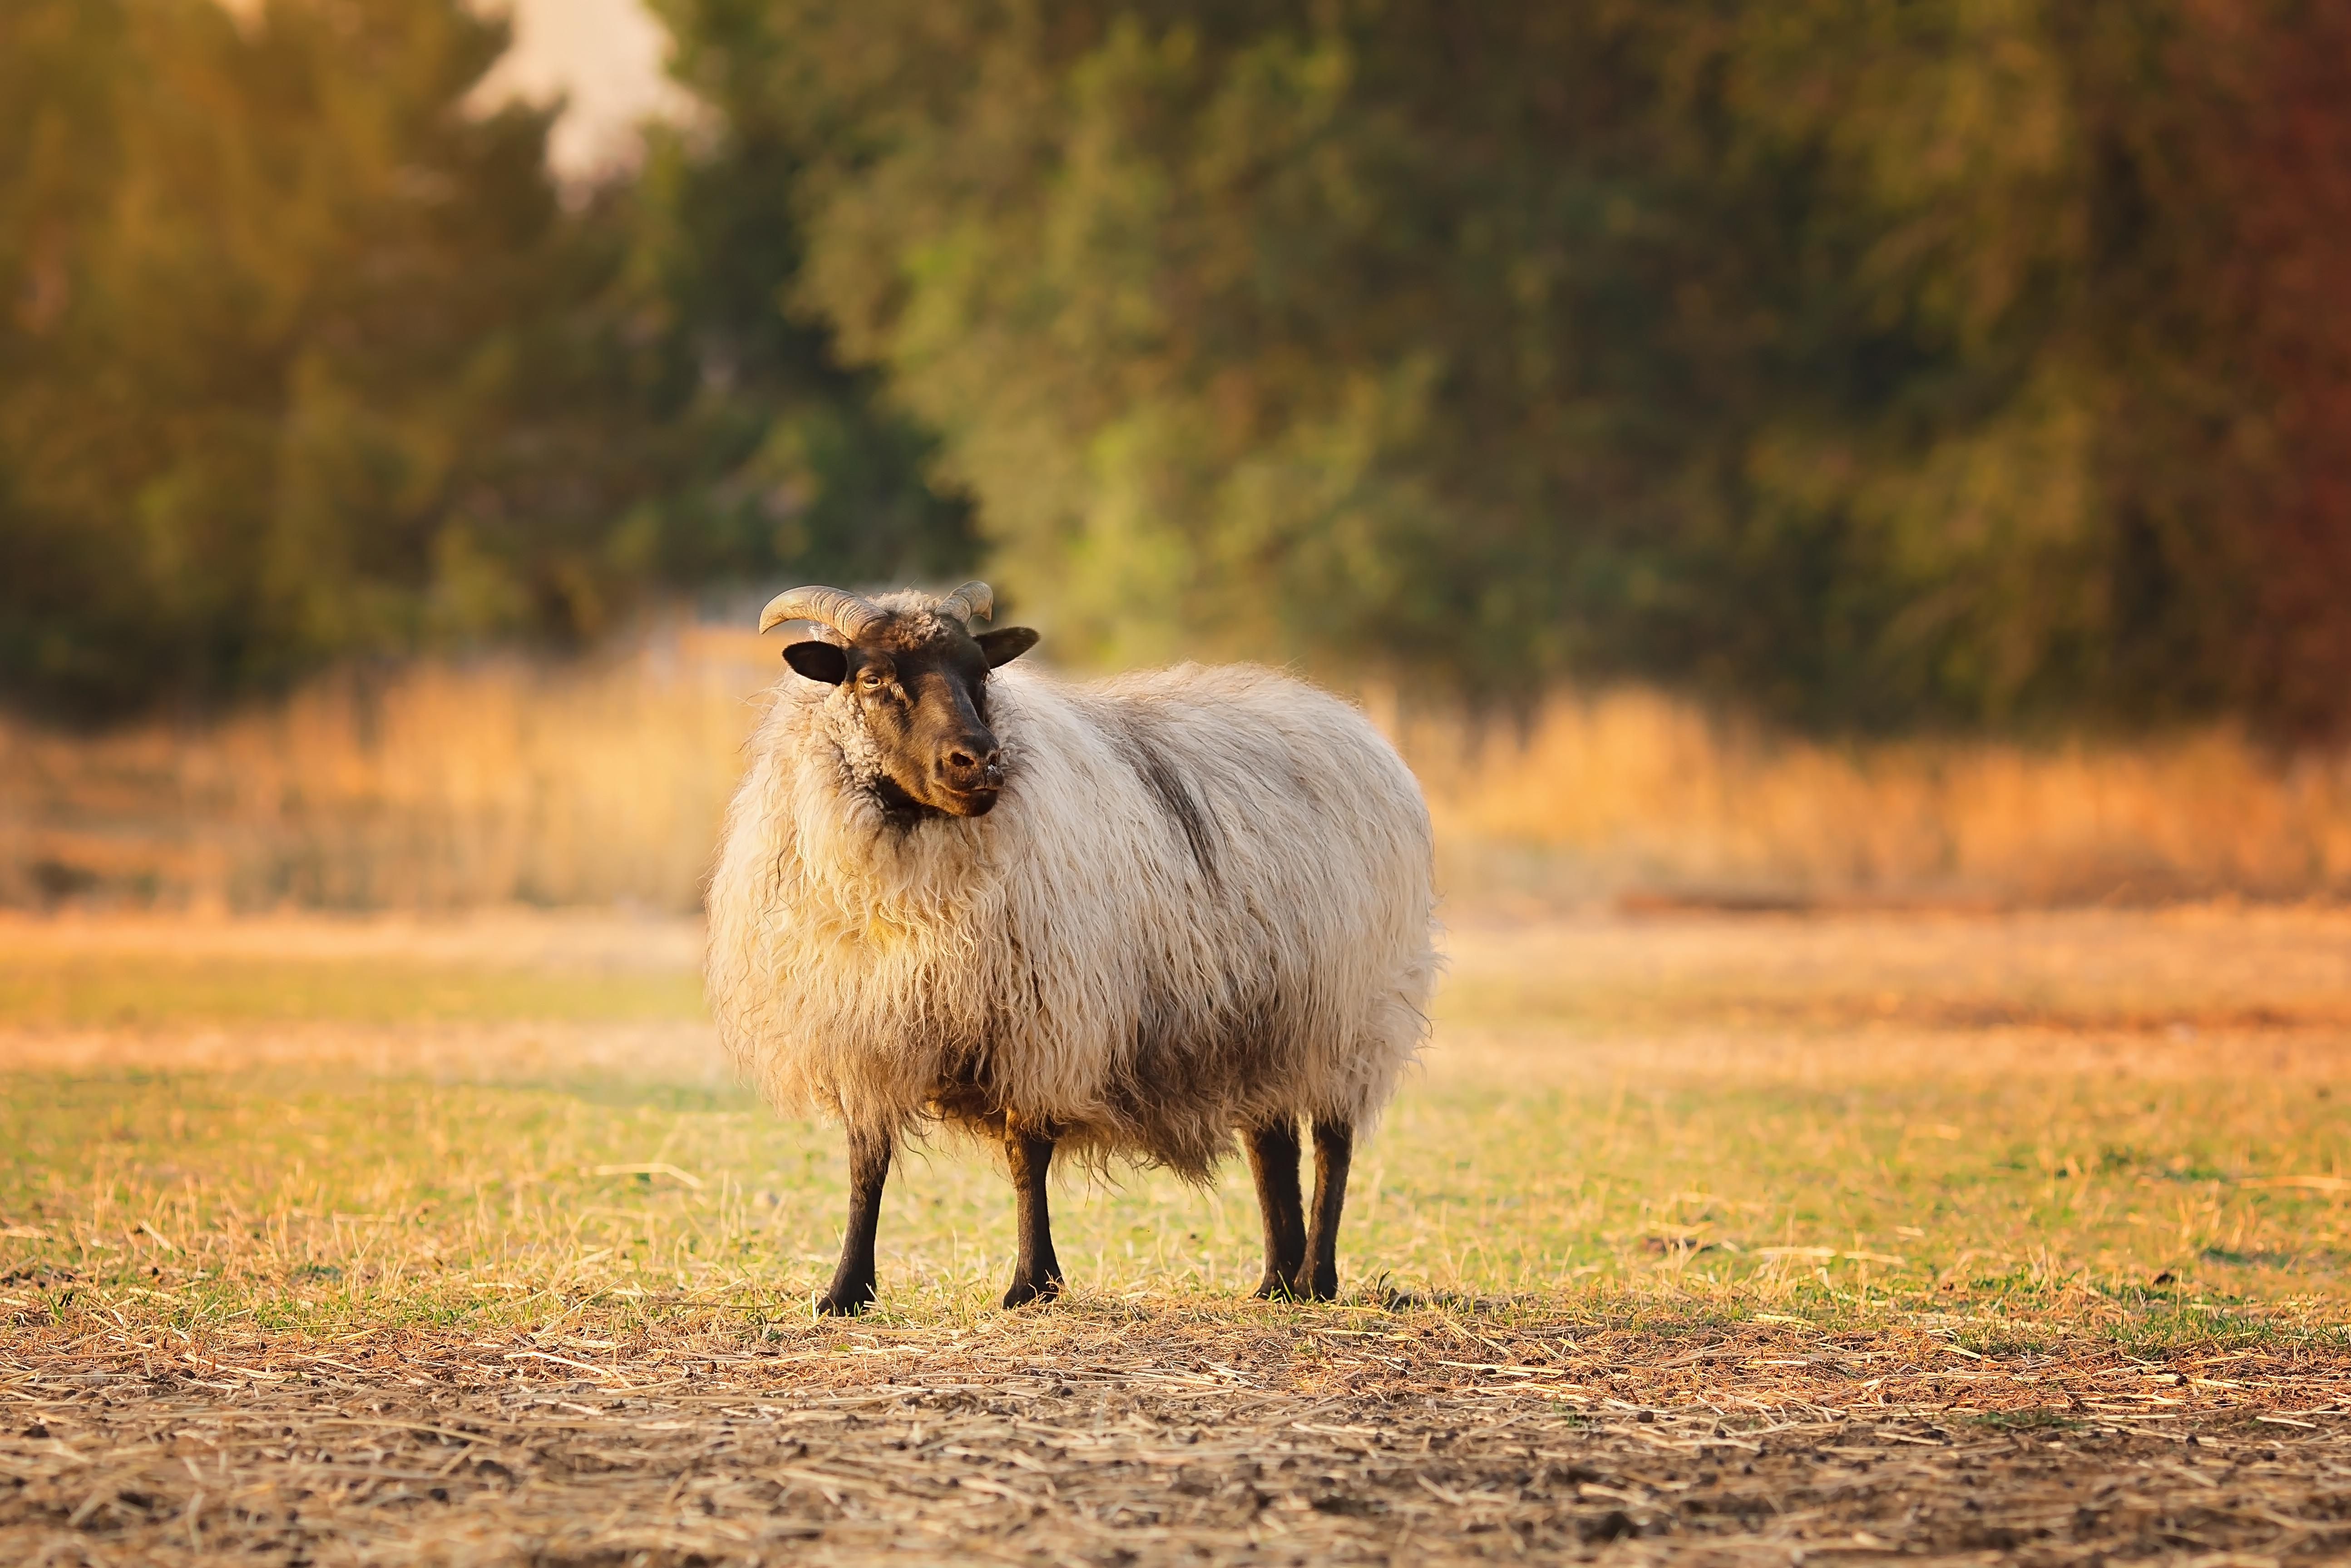 Farm Animal Photography